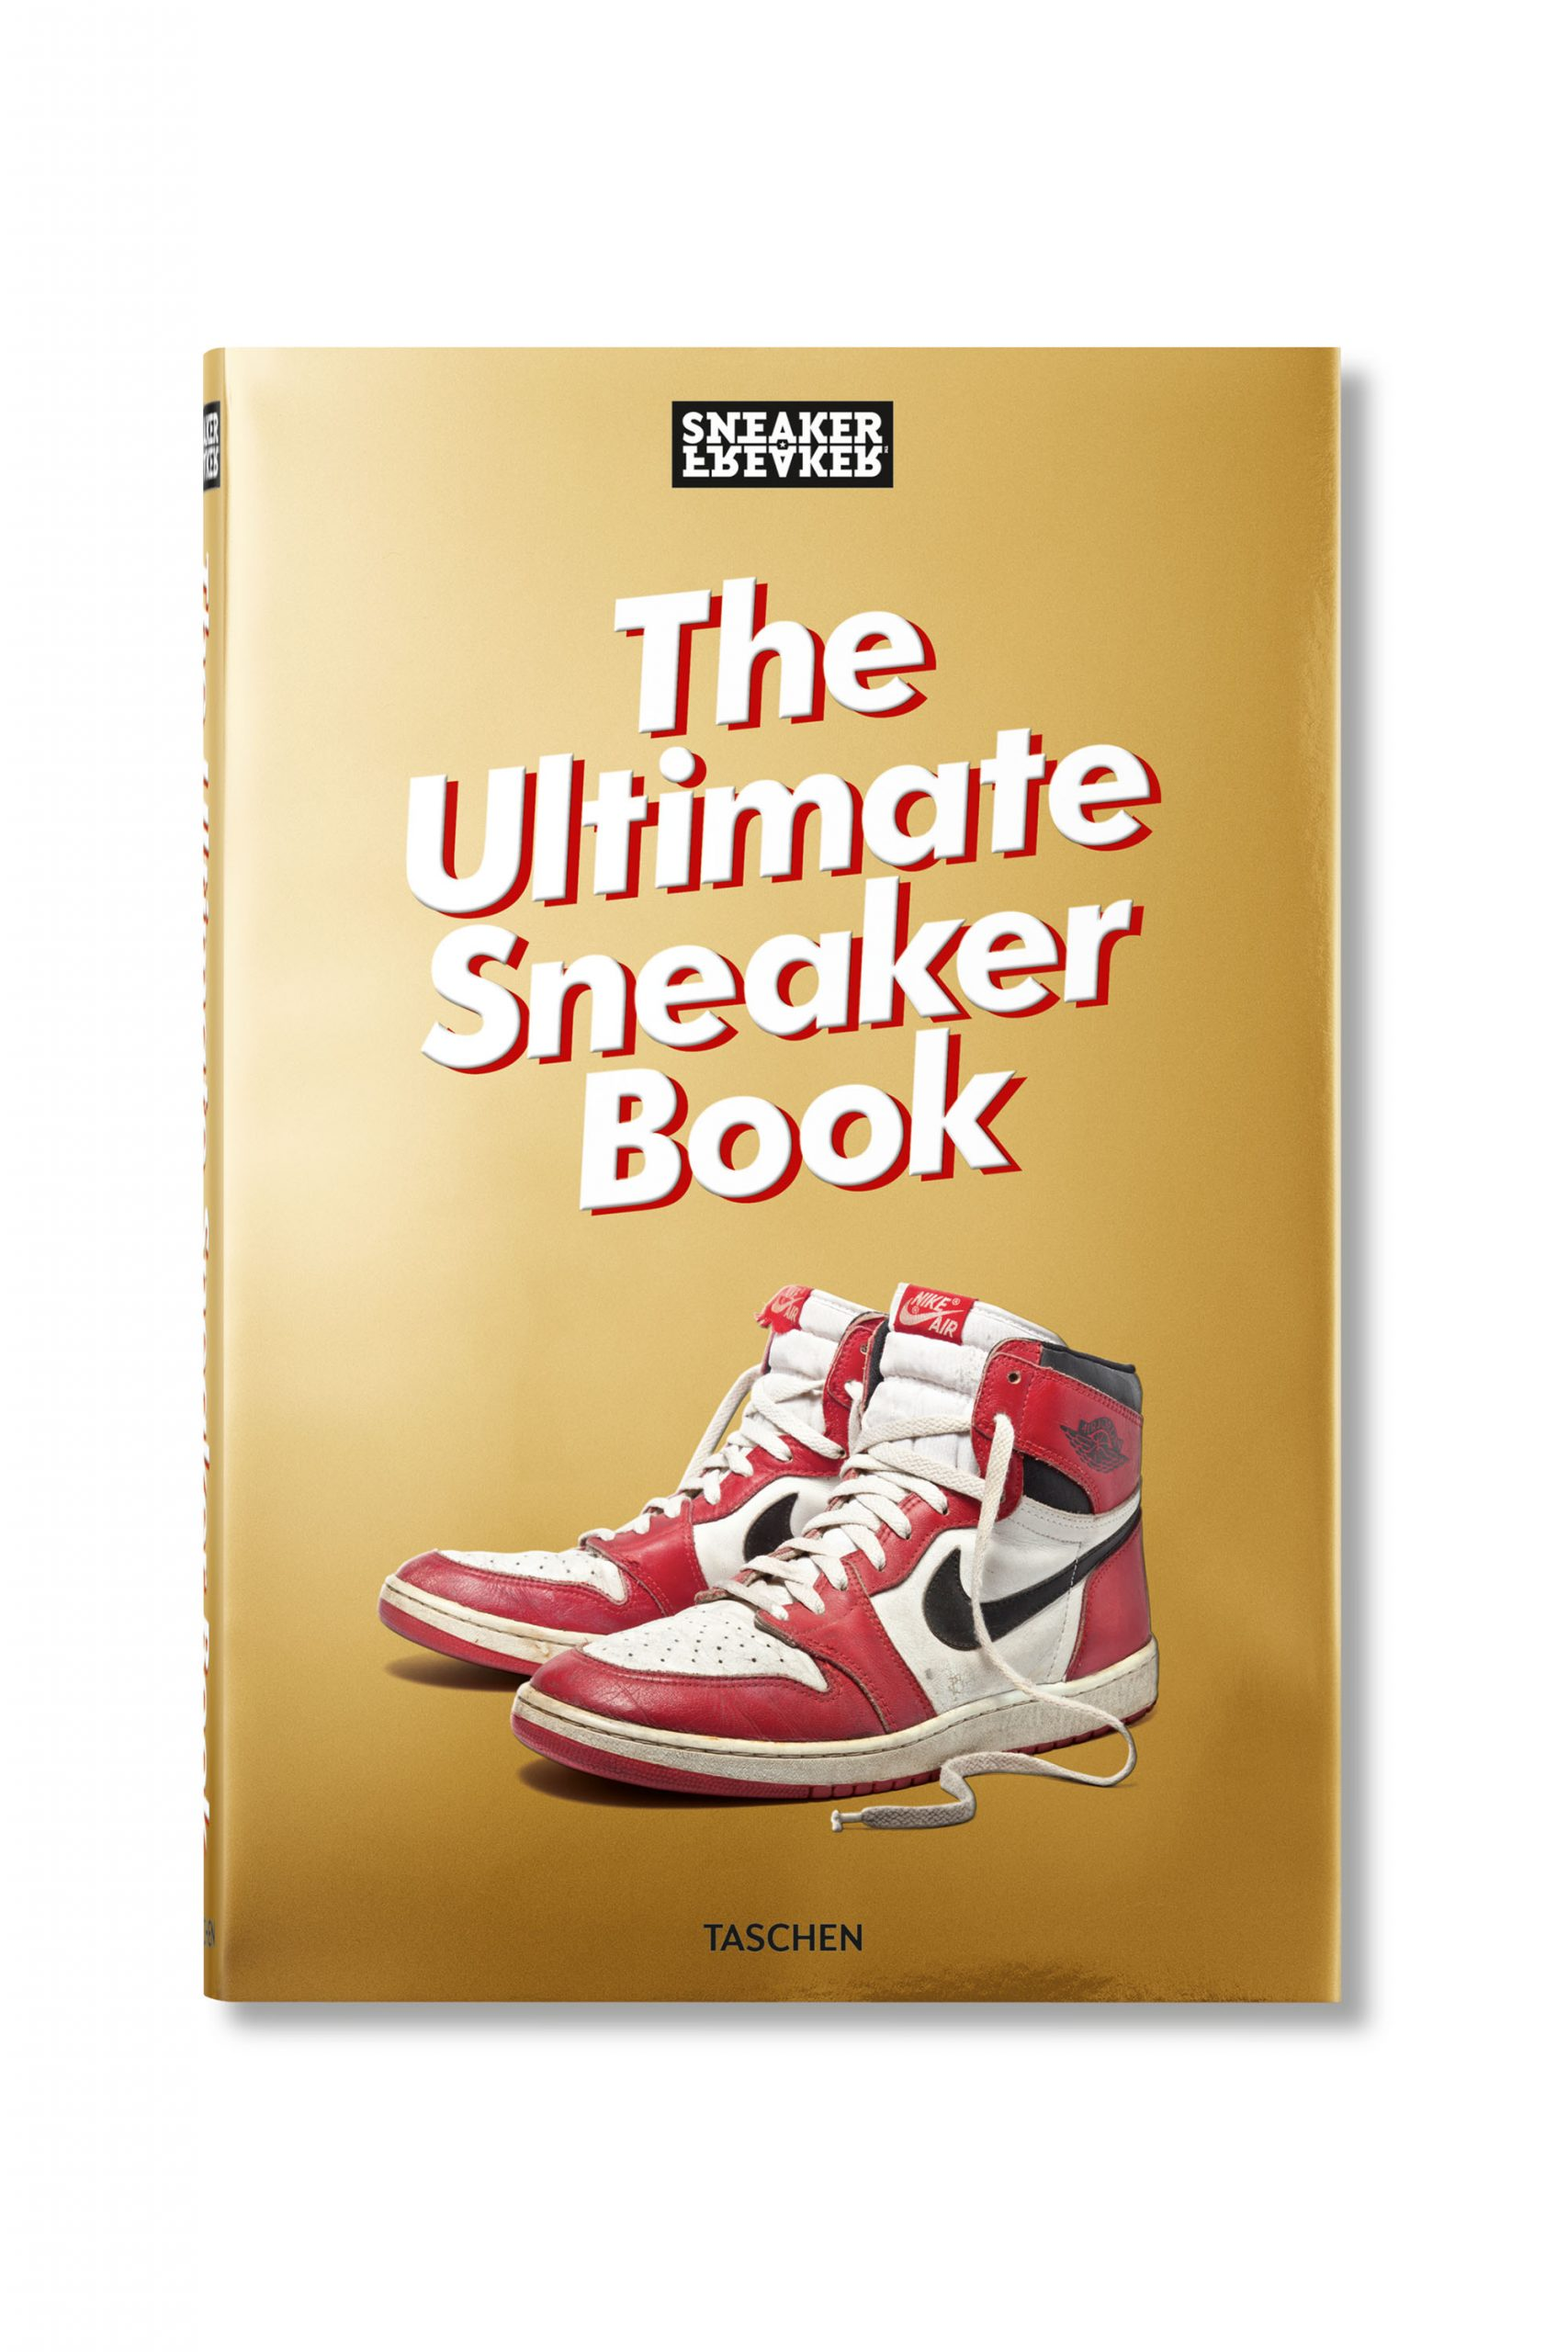 <p class='small-title'>TASCHEN</p>THE ULTIMATE SNEAKER BOOK